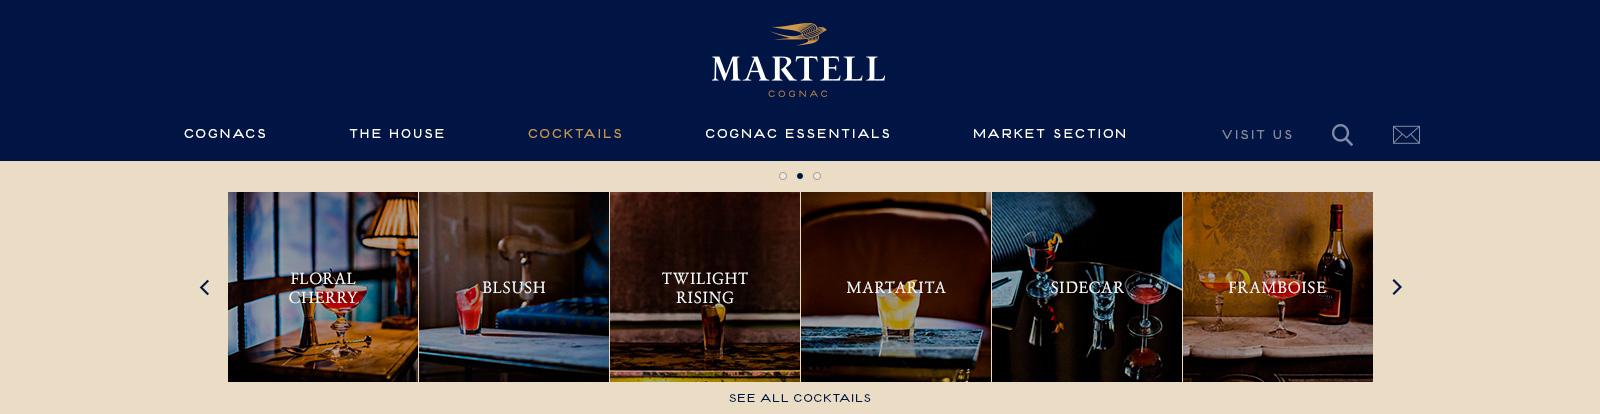 Martell's Large Range of Cocktails SubMenu